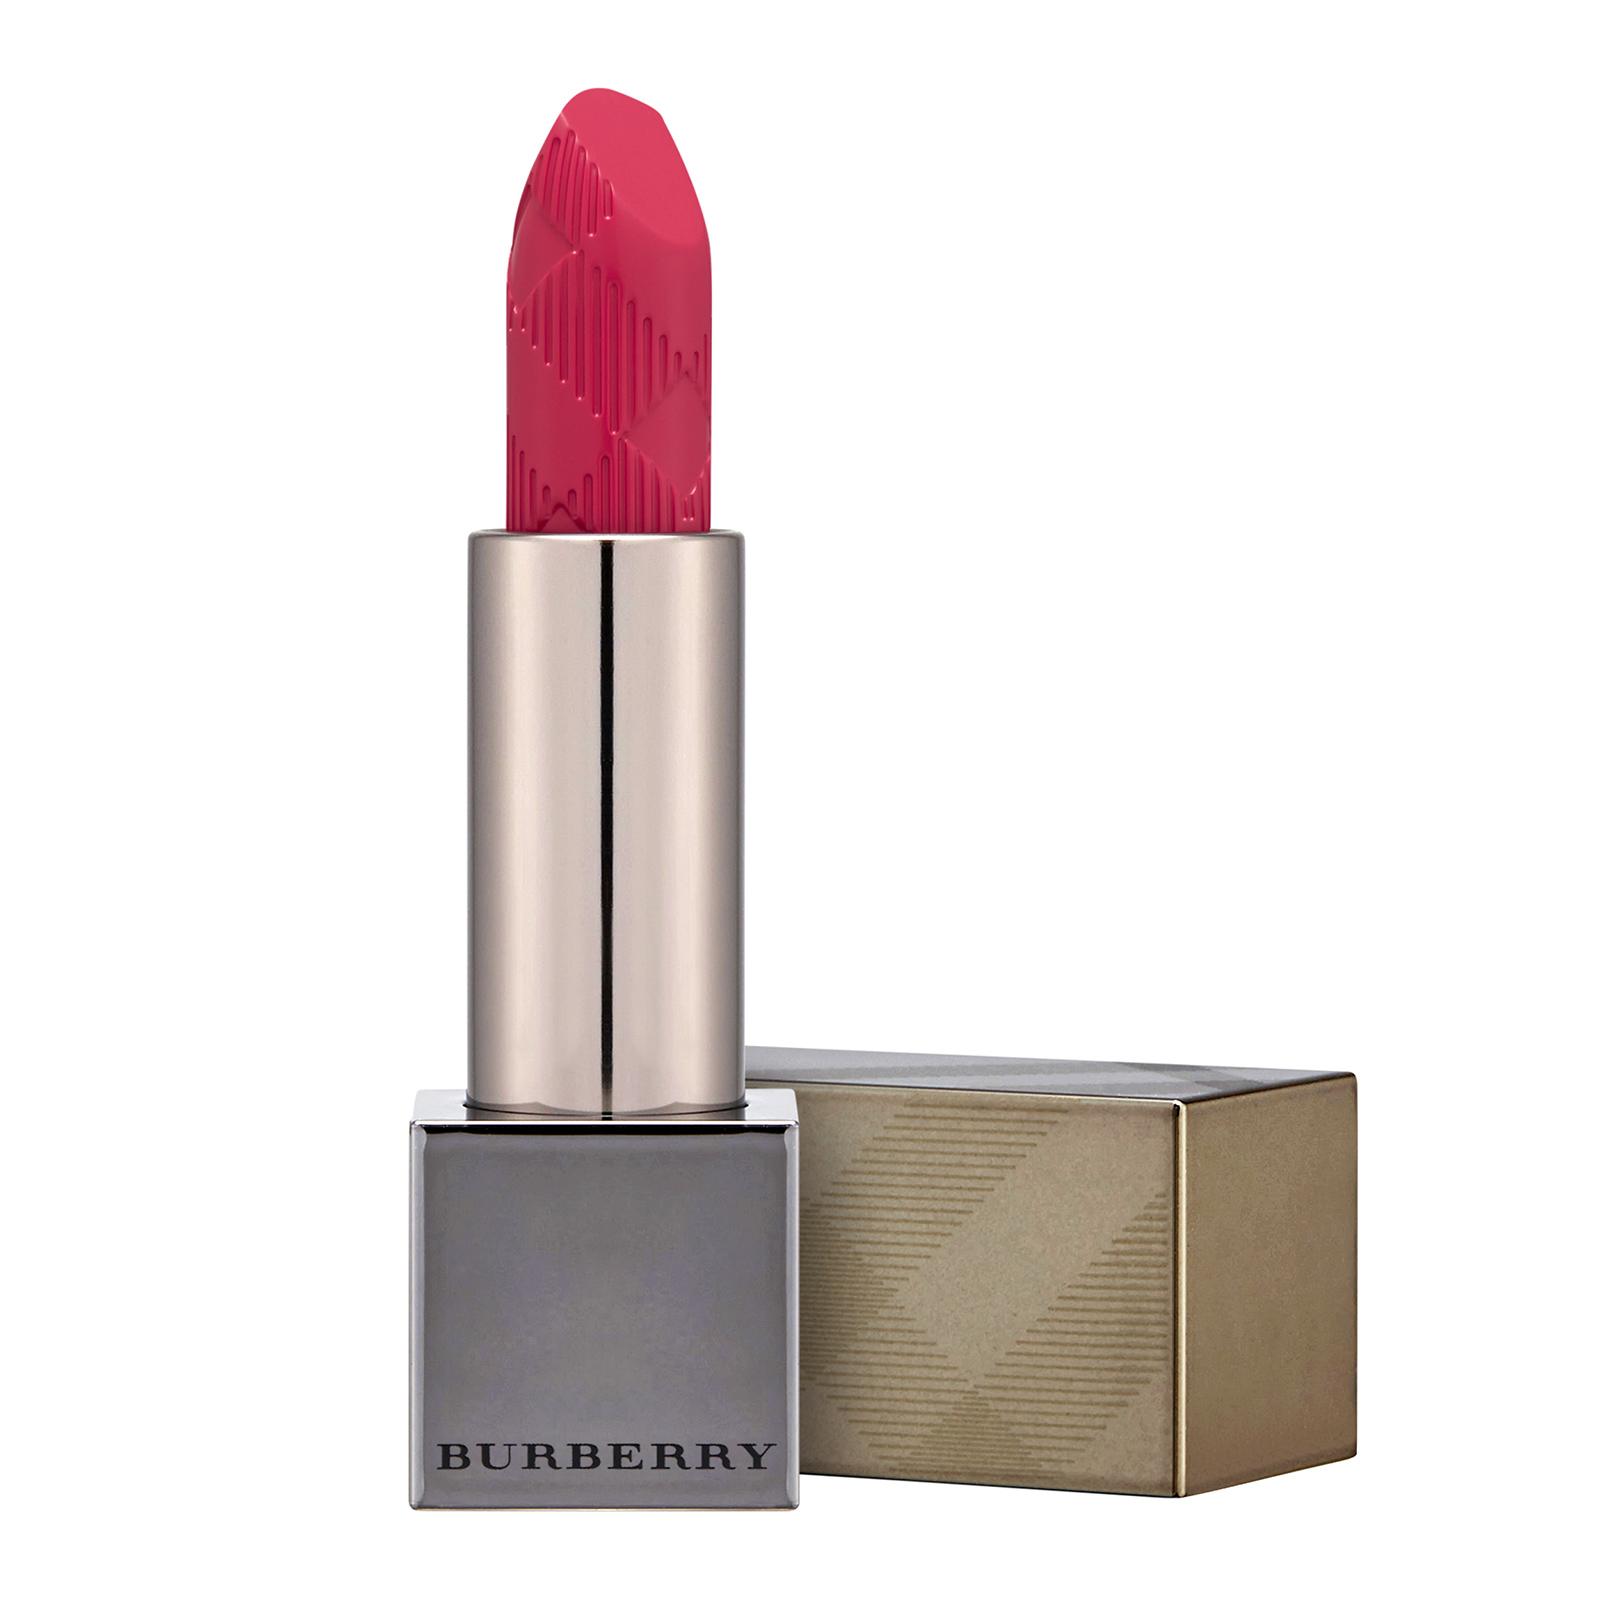 Burberry  Burberry Kisses Hydrating Lip Colour No. 53 Crimson Pink, 0.11oz, 3.3g